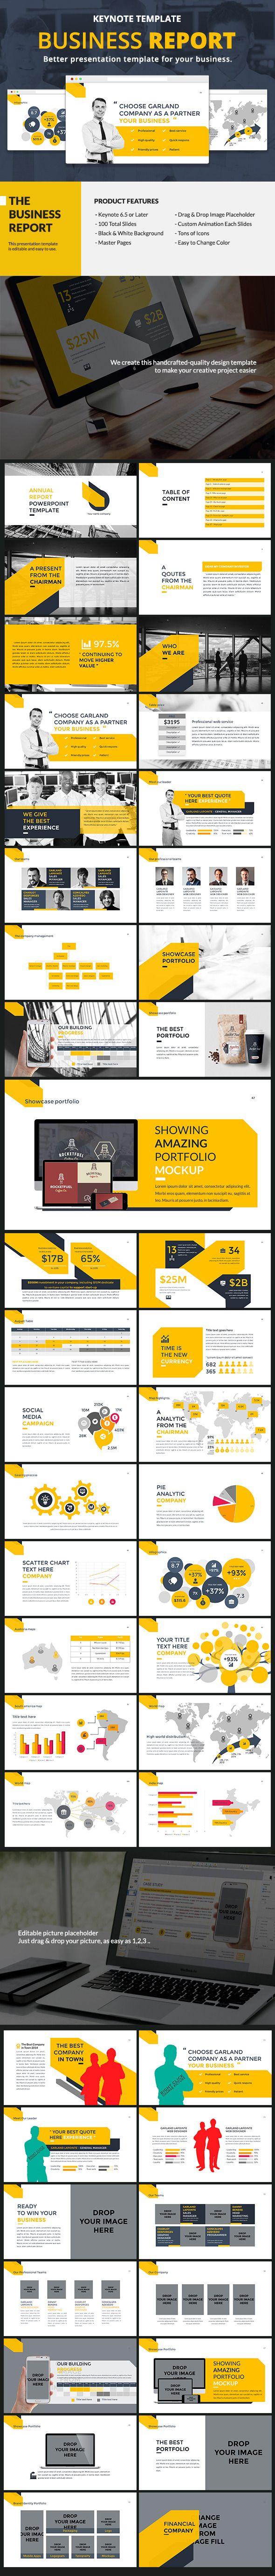 Business Report Keynote Template #design #slides Download: http://graphicriver.net/item/business-report-keynote/12624296?ref=ksioks